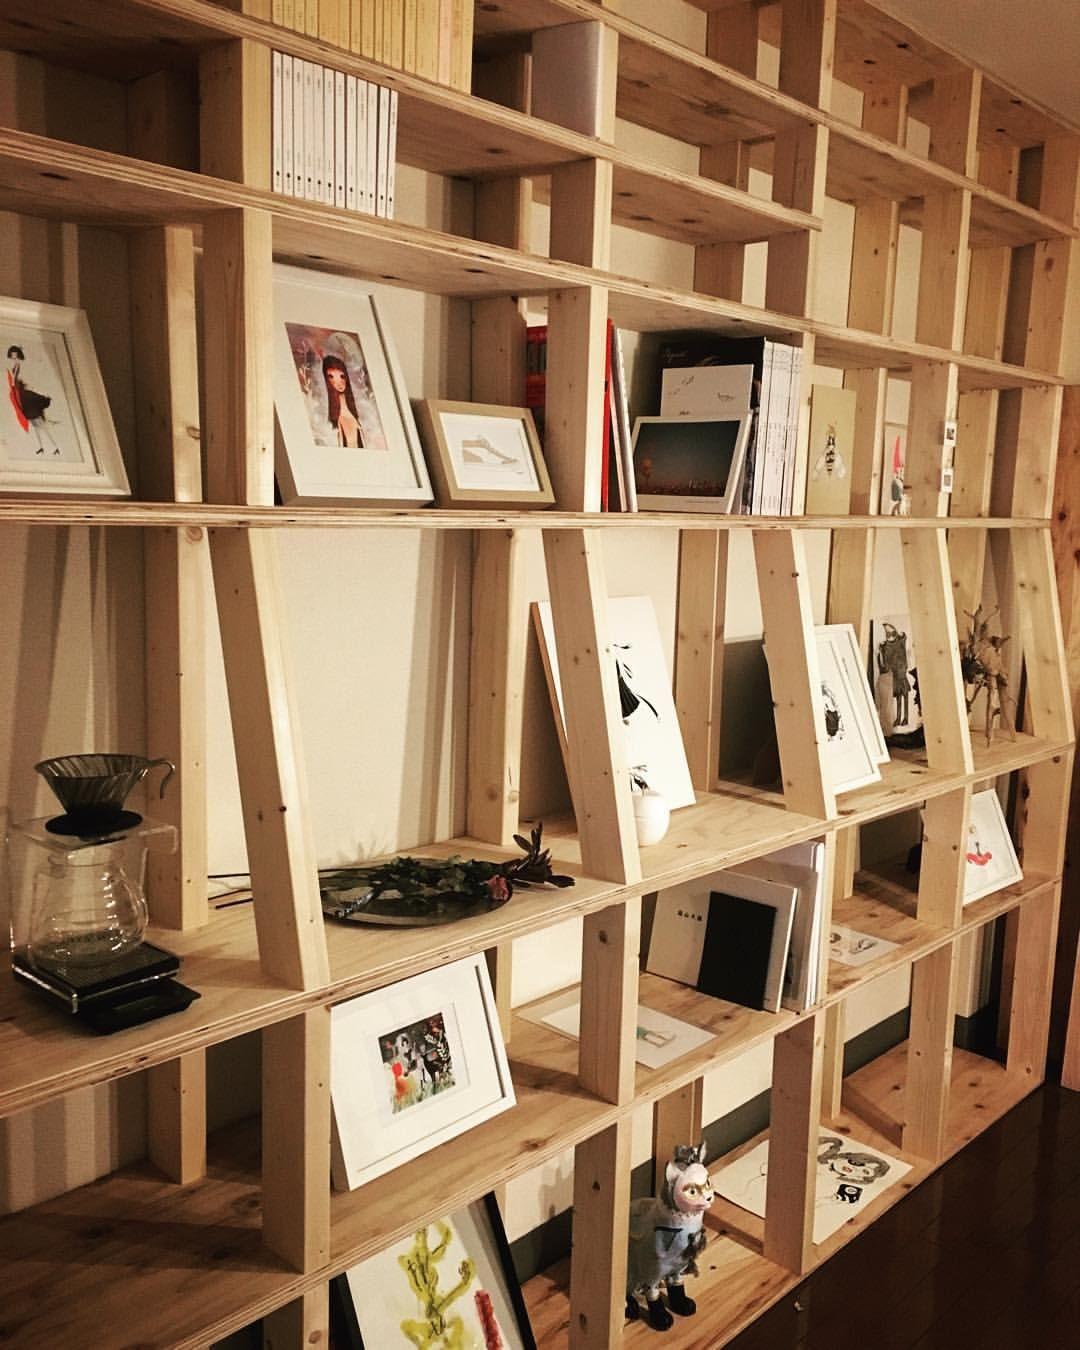 update info. shelf in N_residence I wanna business in